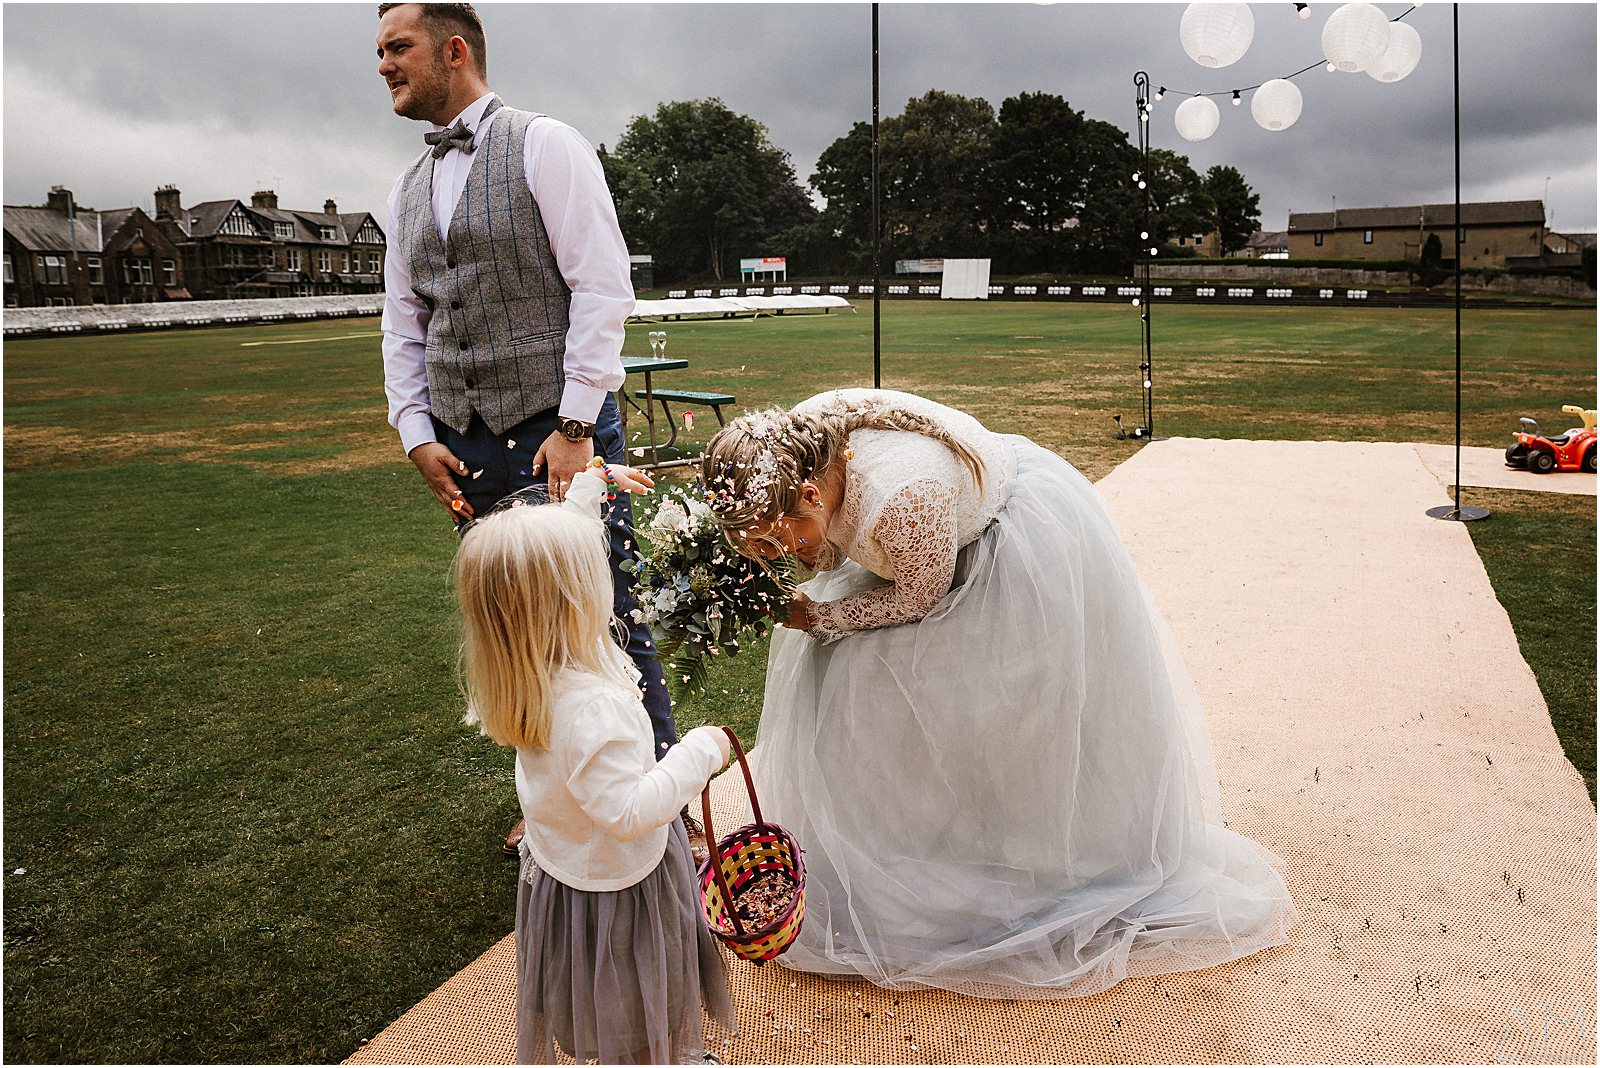 Girl throws confetti on bride